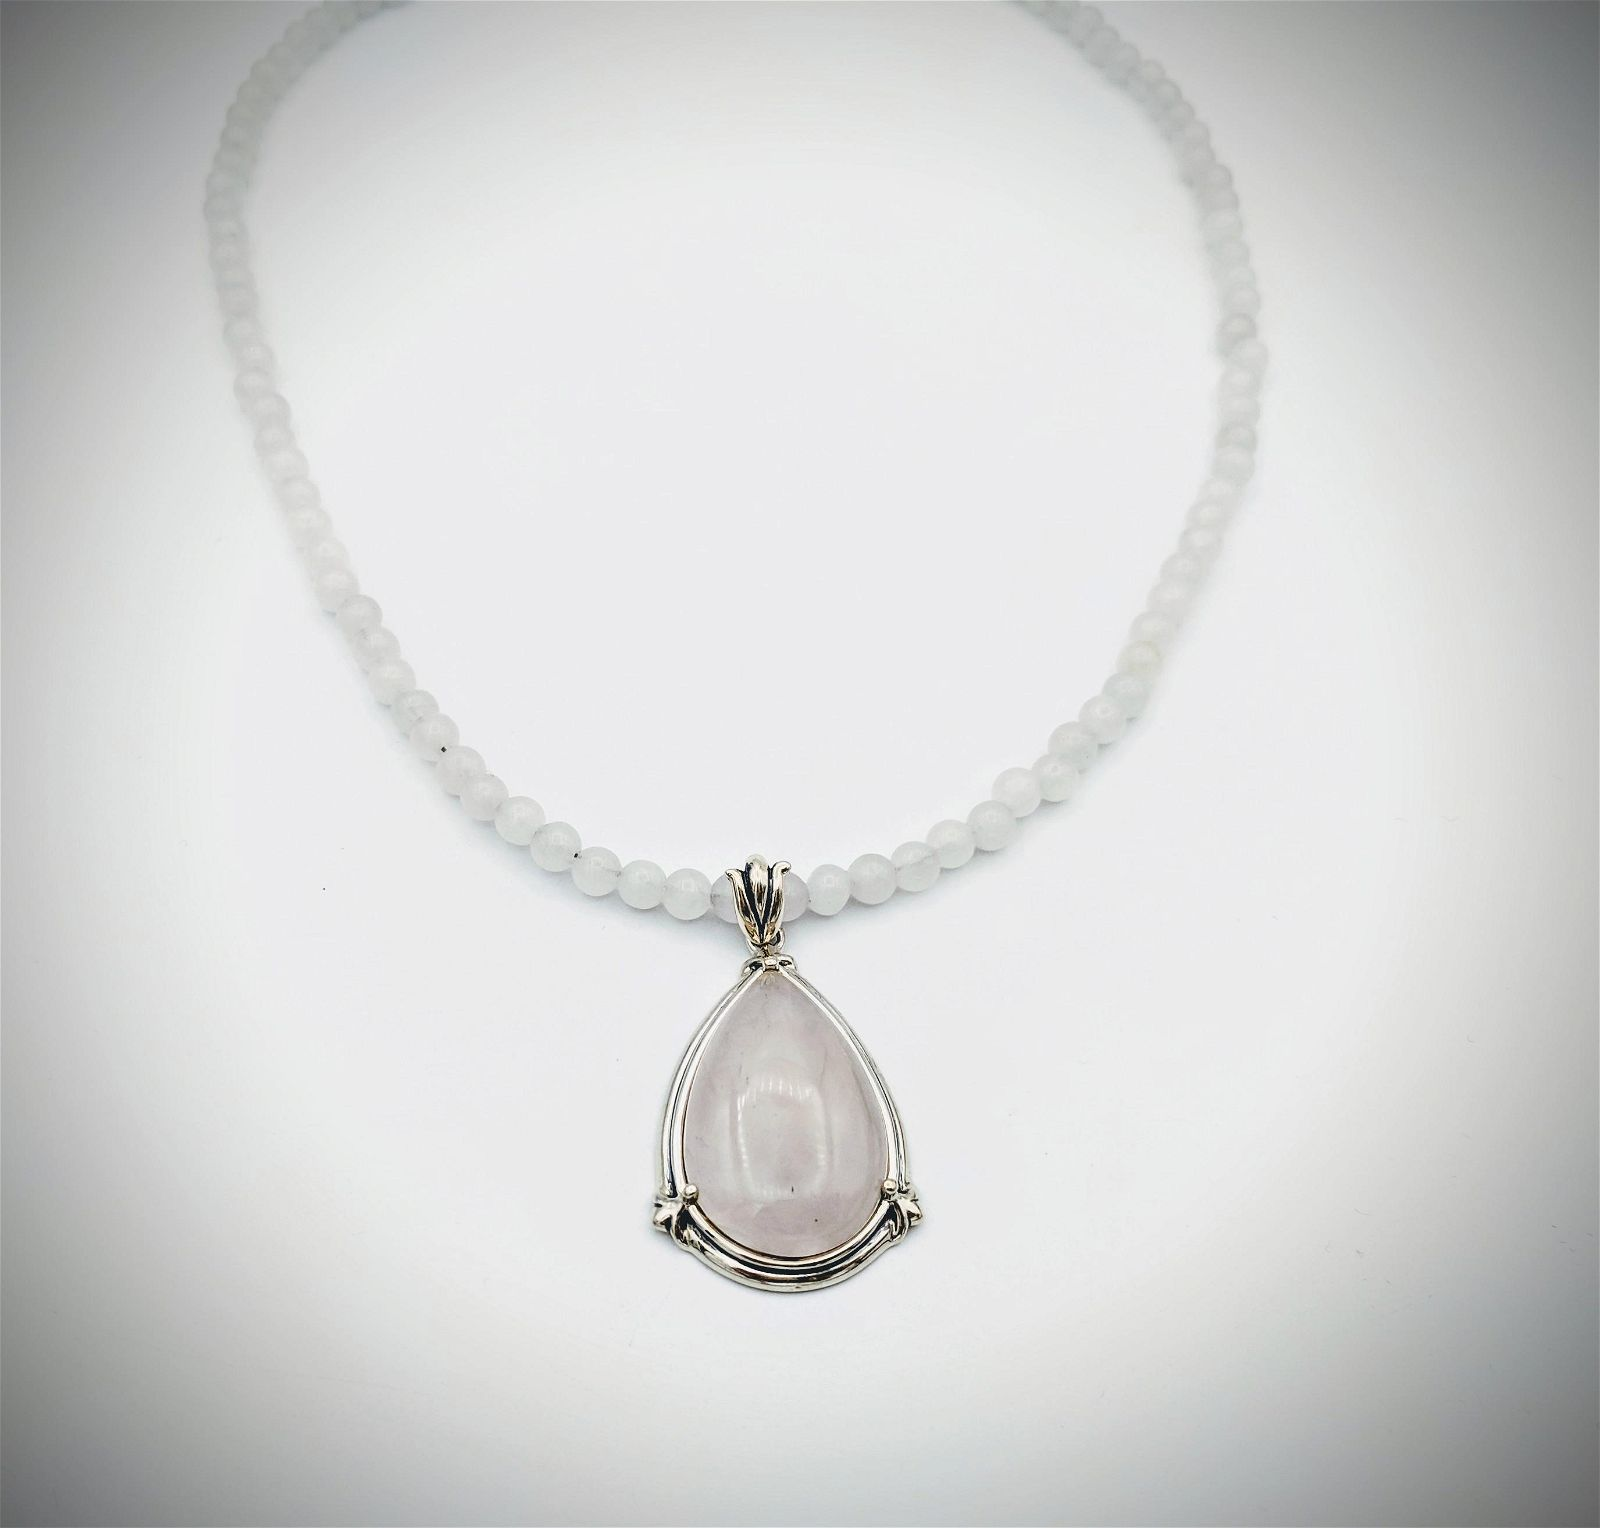 Beaded White Onyx Necklace w Rose Quartz Pendant